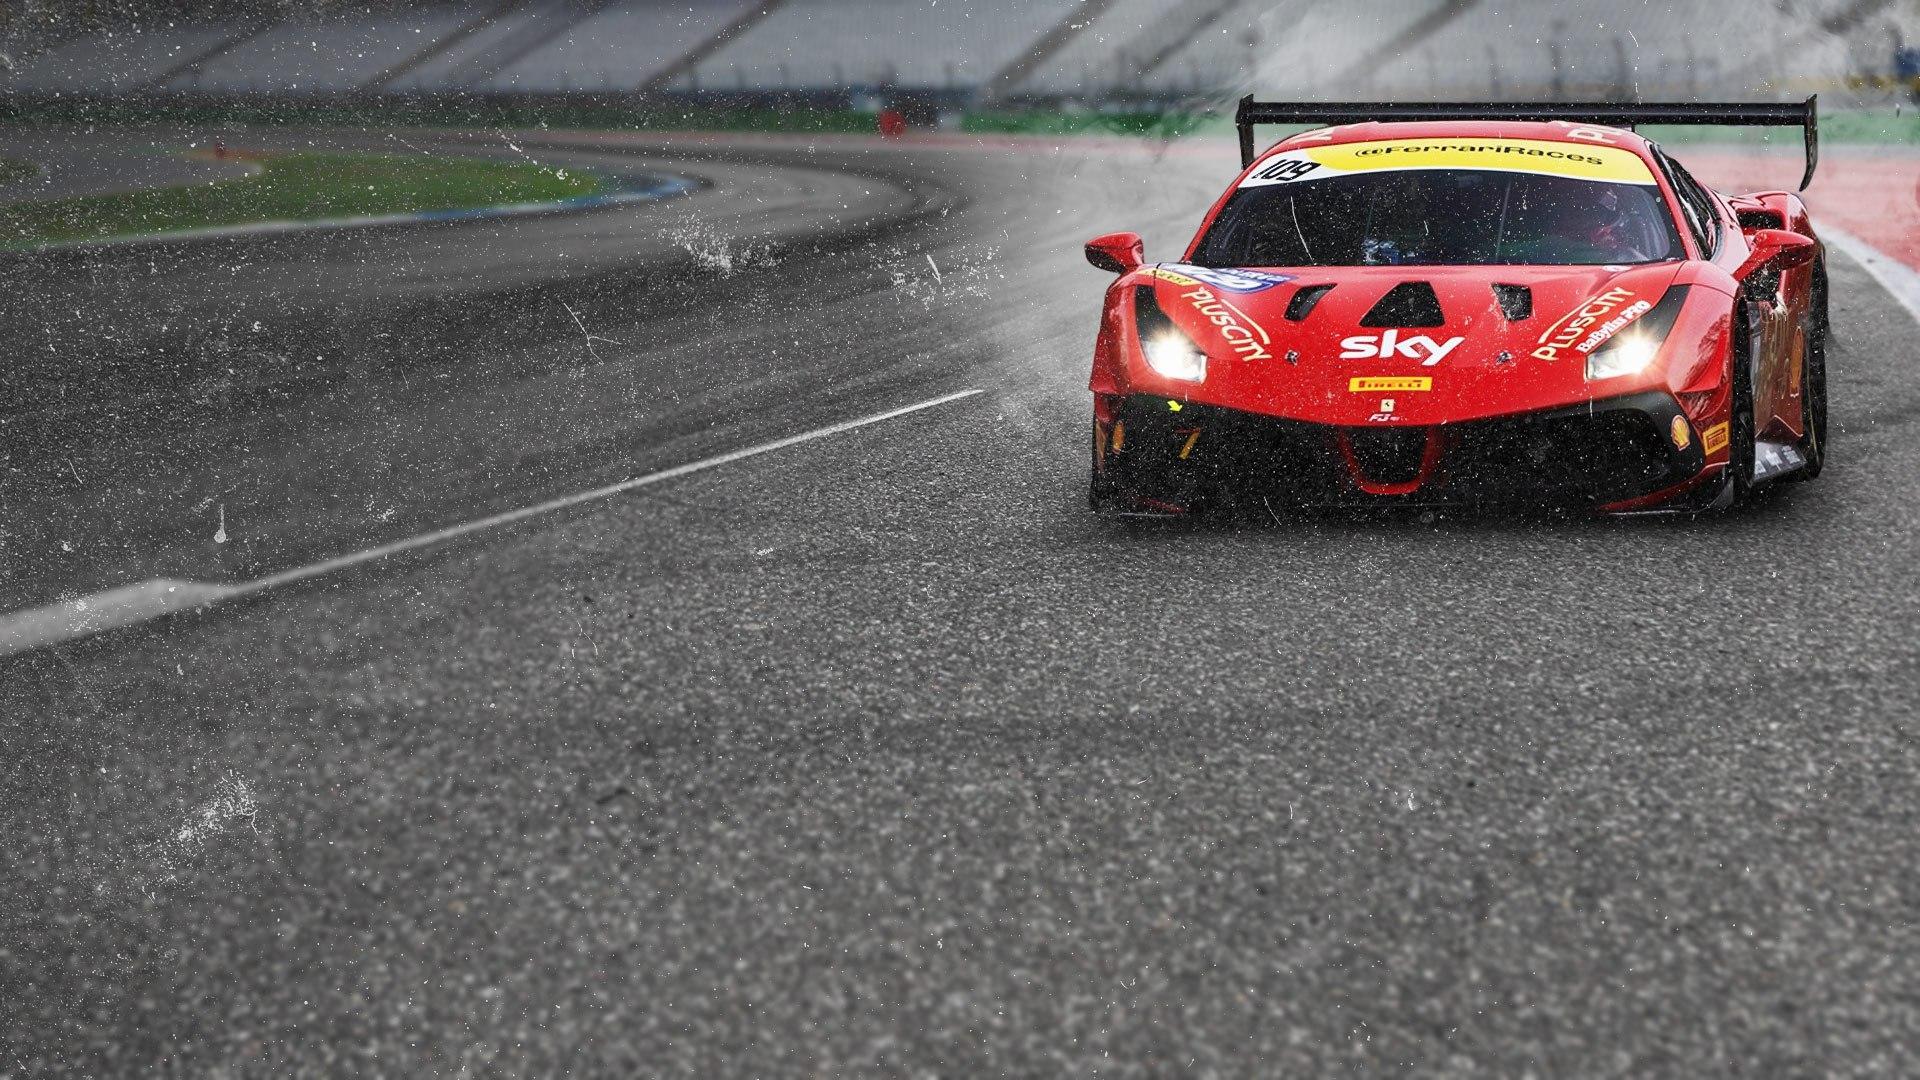 Sky Sport Arena Trofeo Pirelli Spielberg. Gara 2